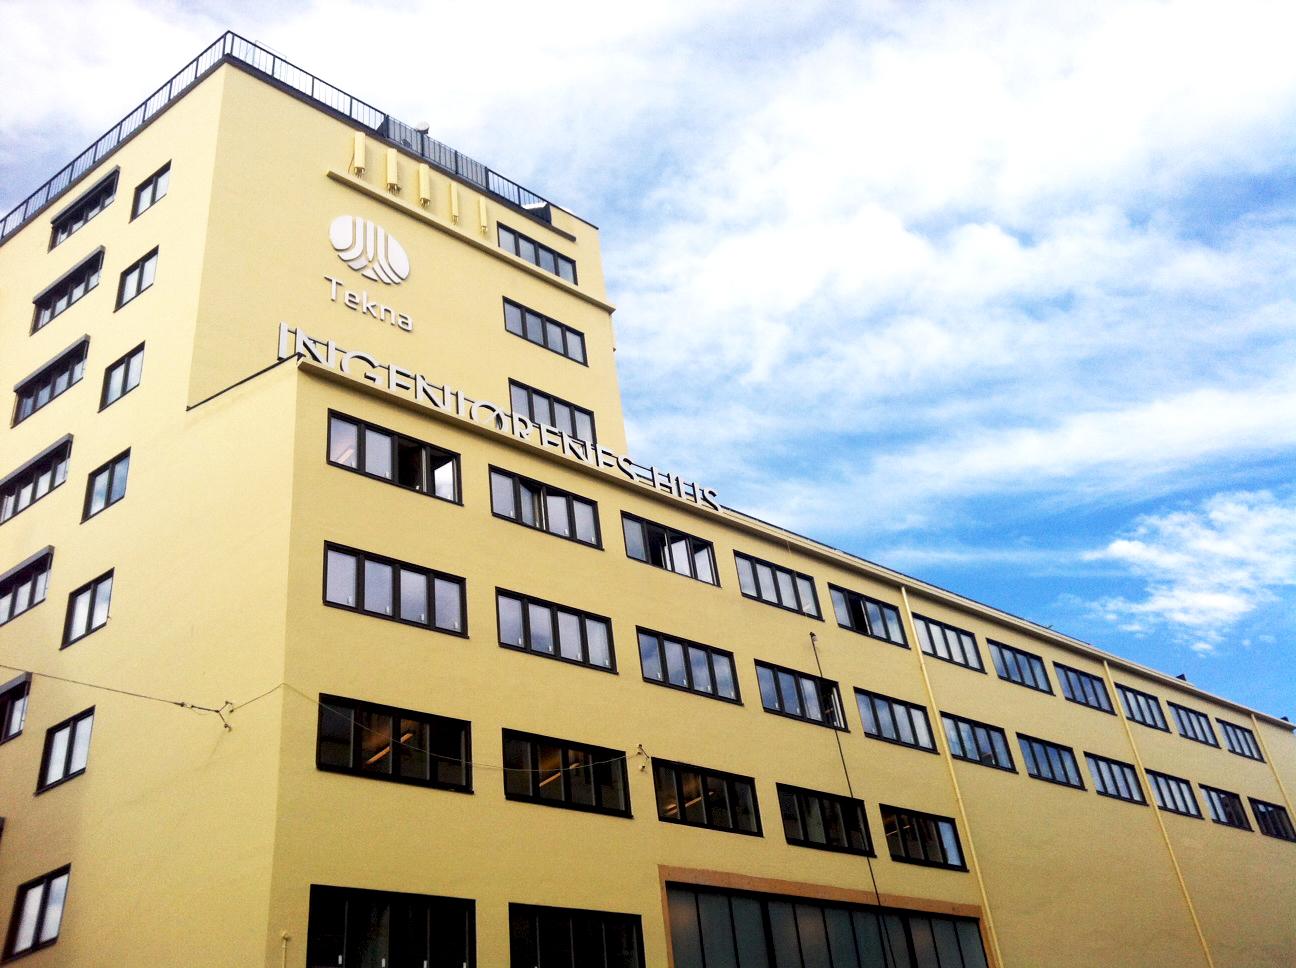 Ingeniørenes Hus Conference Center - Kronprinsens gate 170251 Oslo E-mail: inghus.konferanse@eurest.no Phone: (+47) 21 09 67 20